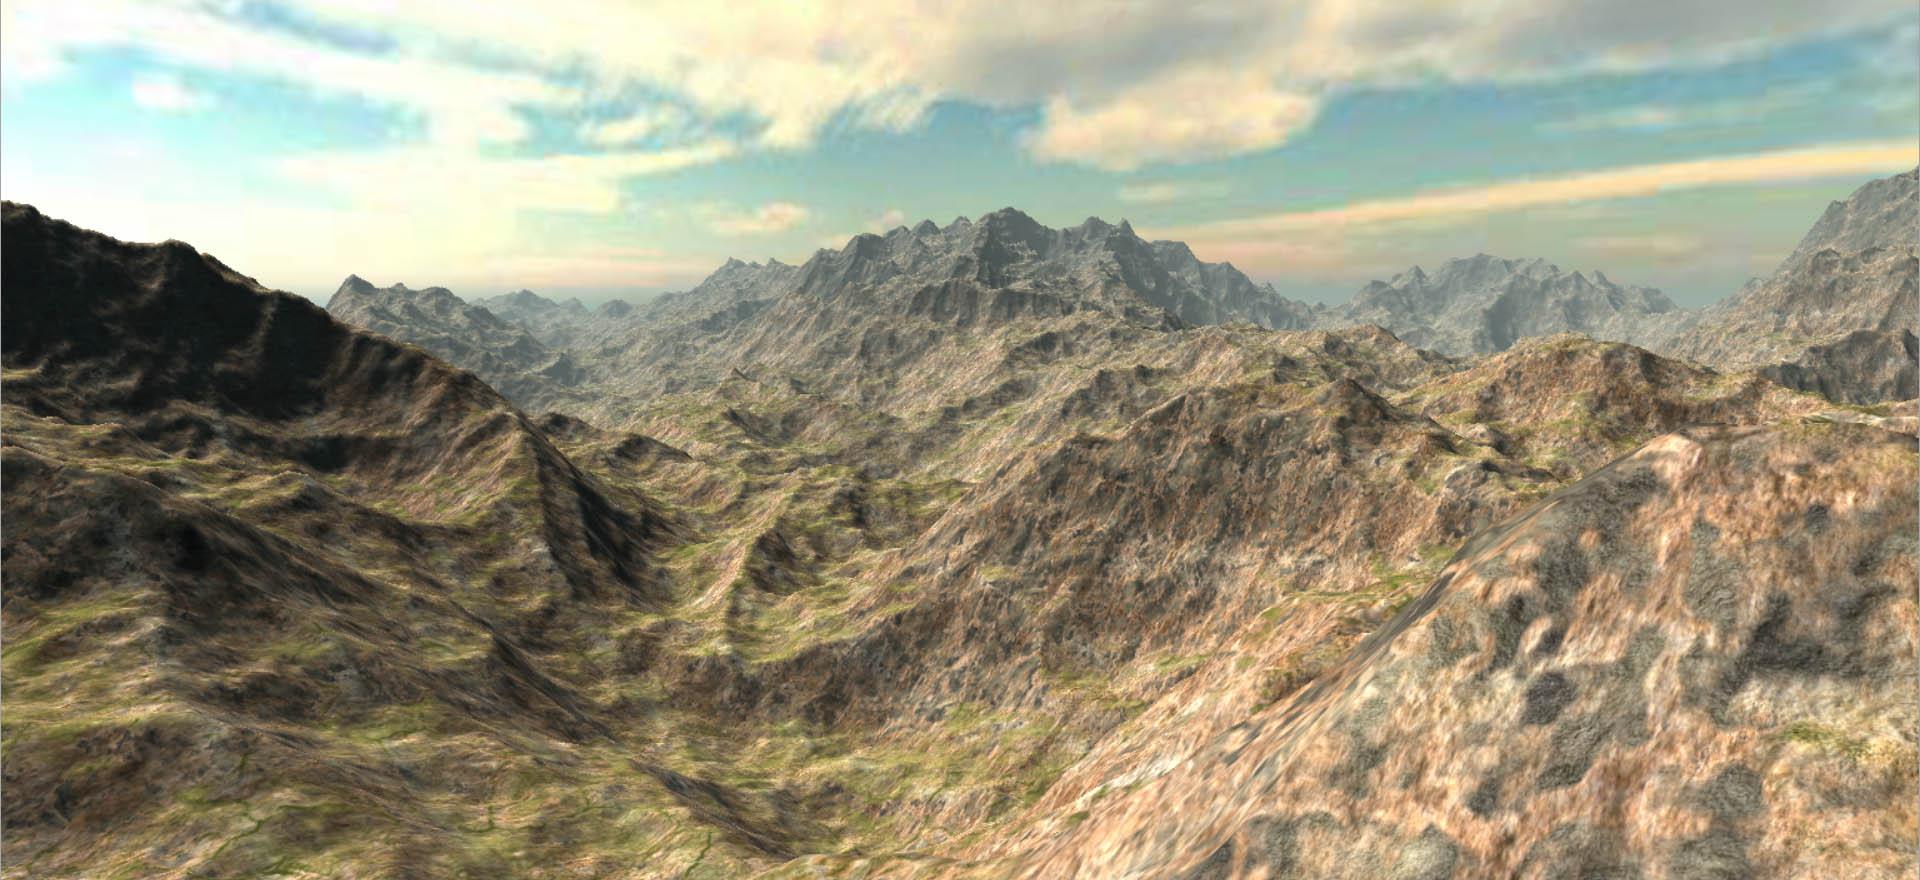 scape_ridge_mountains.jpg